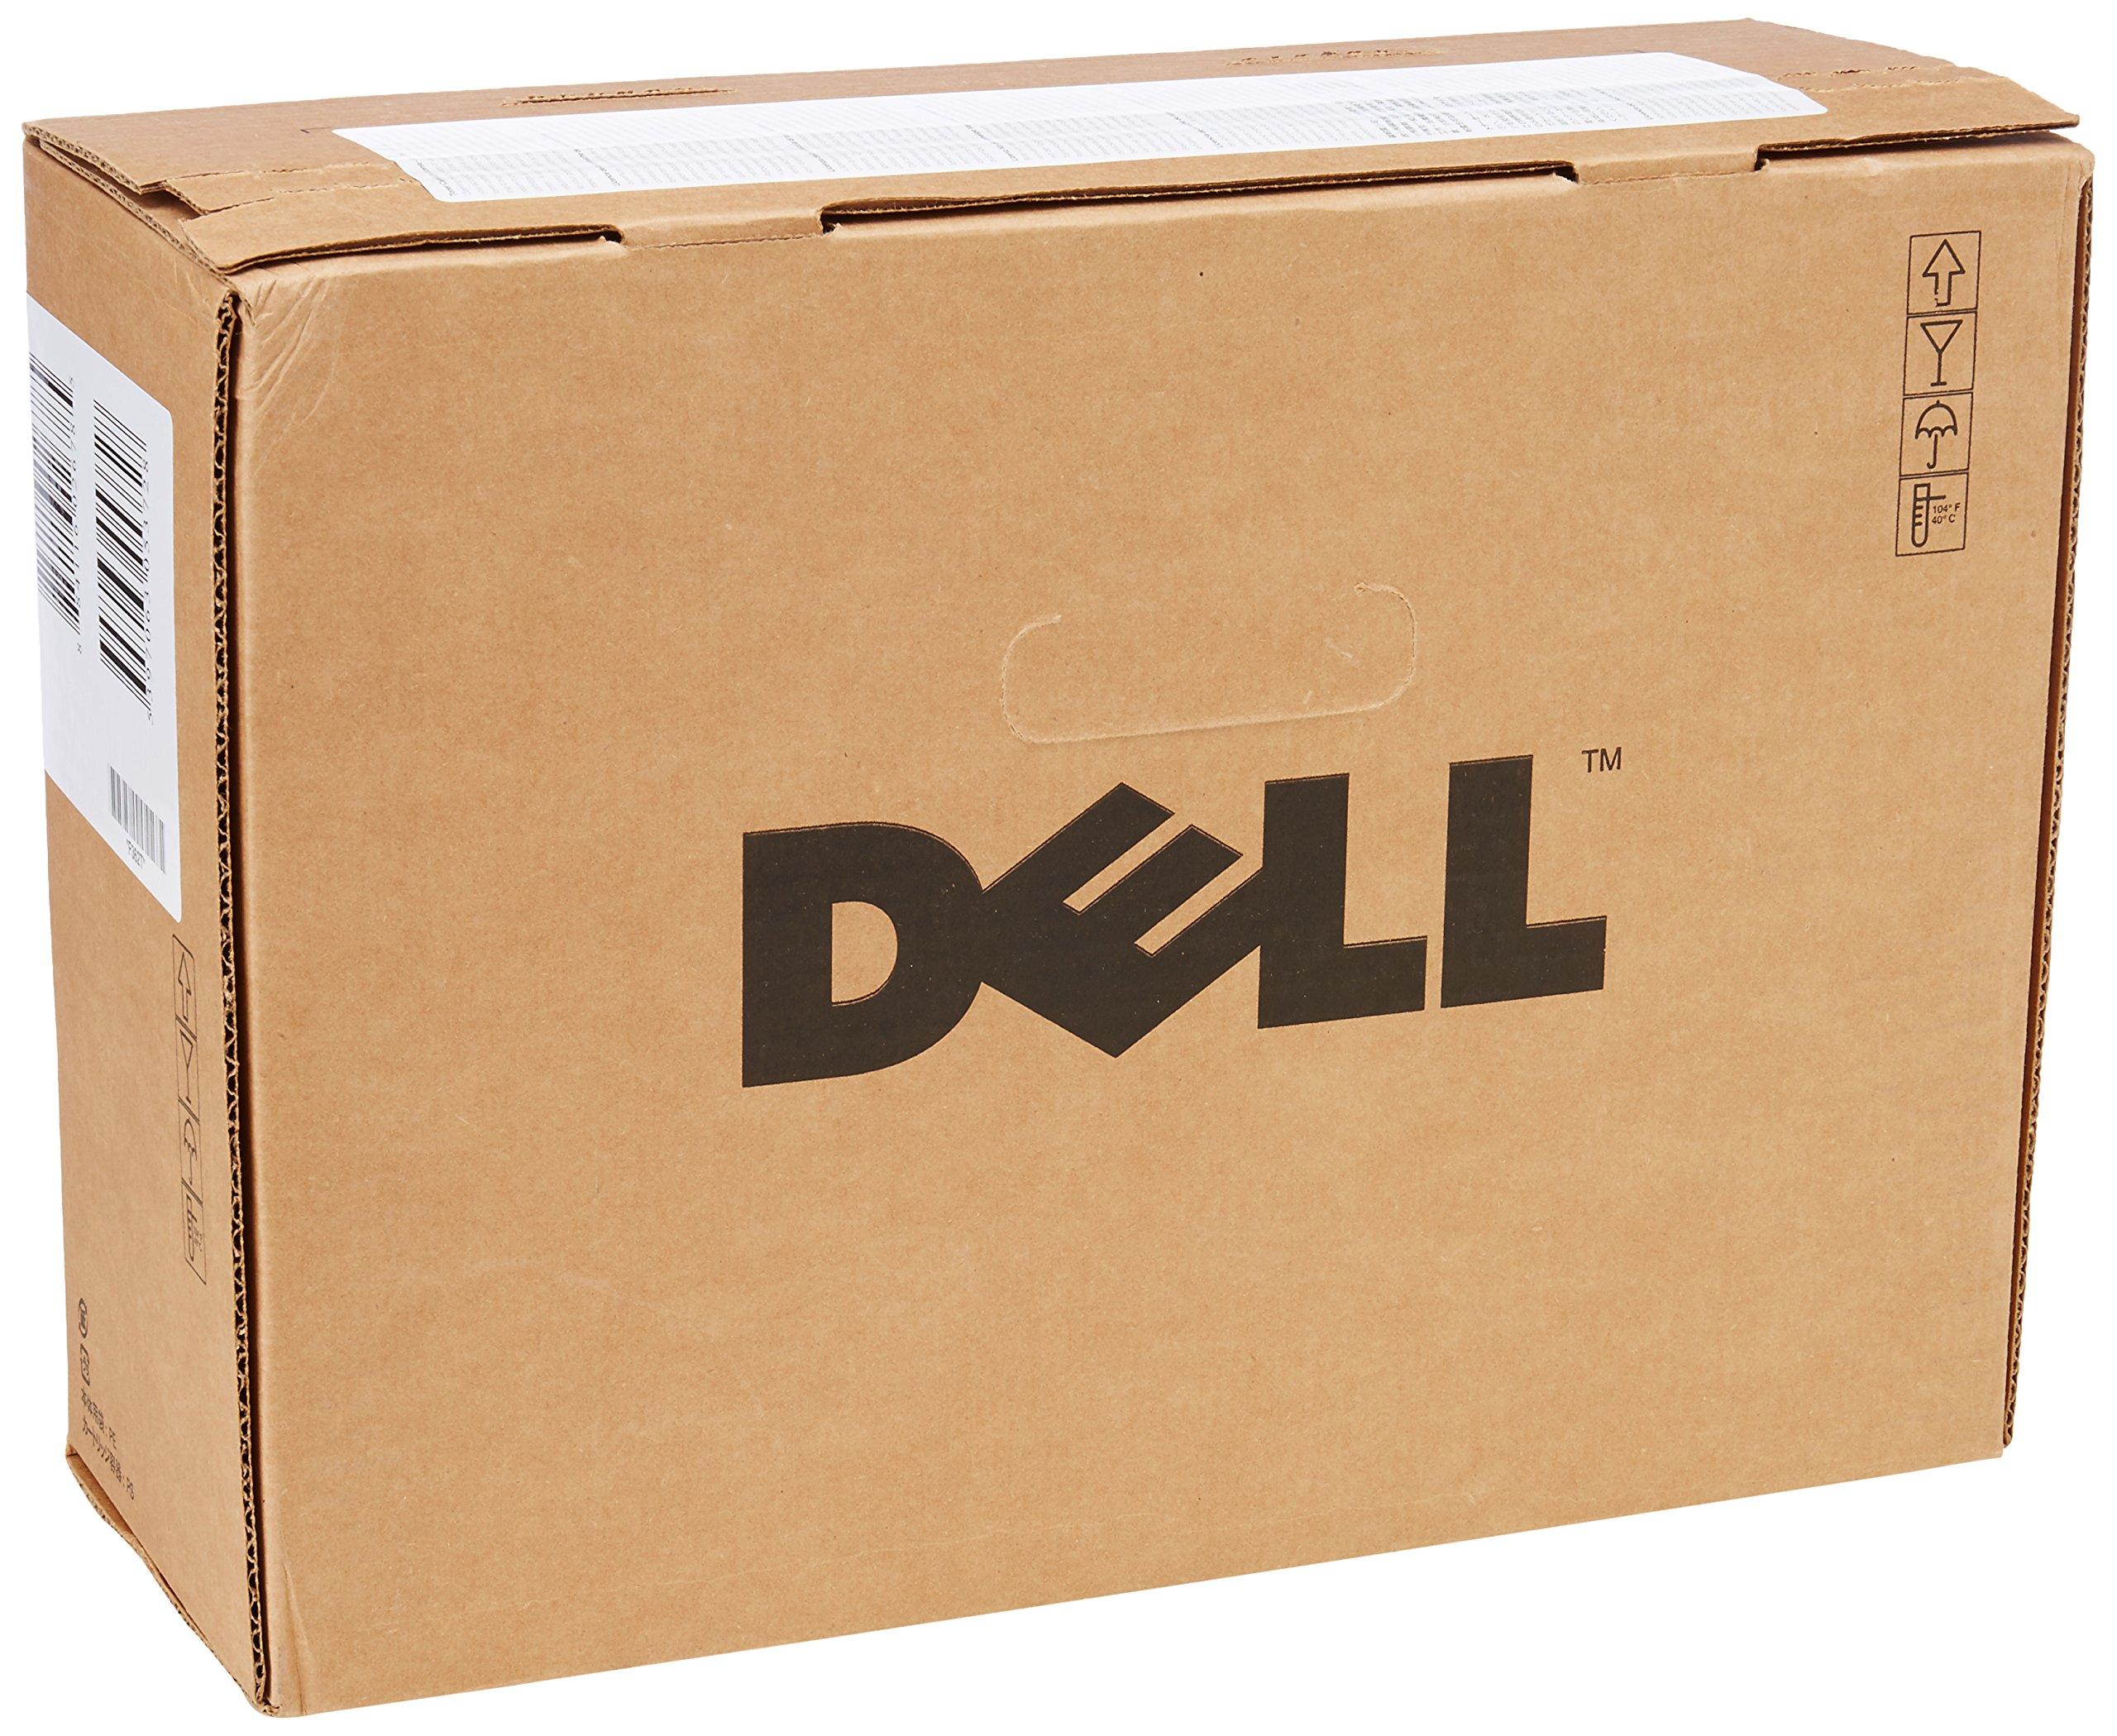 Dell F362T Toner Cartridge 5230n/5230dn/5350dn Laser Printers